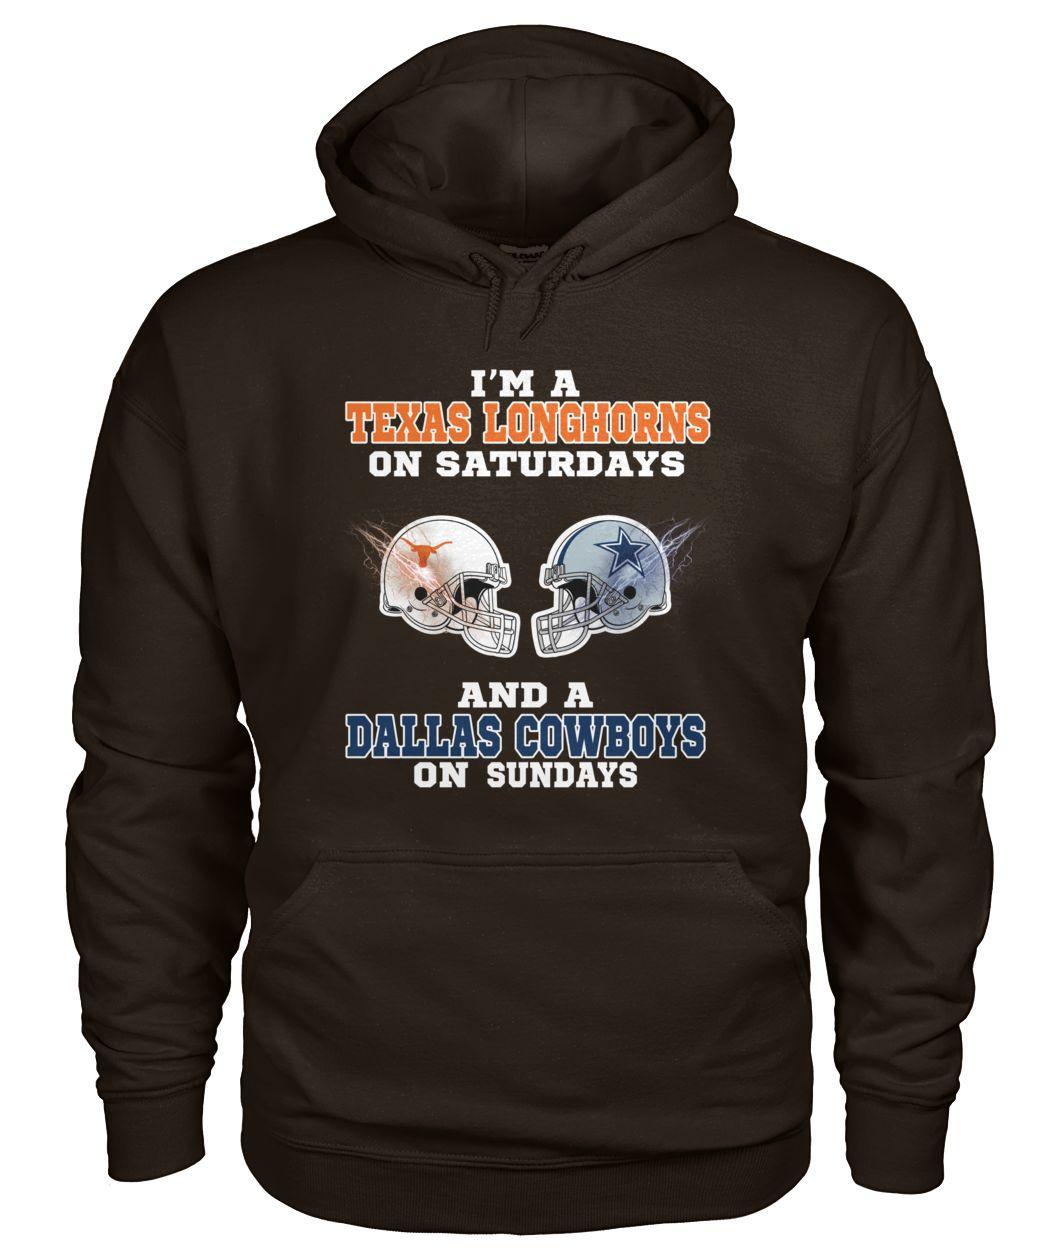 I'm a Texas Longhorns on Saturdays and a Dallas Cowboys on Sundays Hoodie